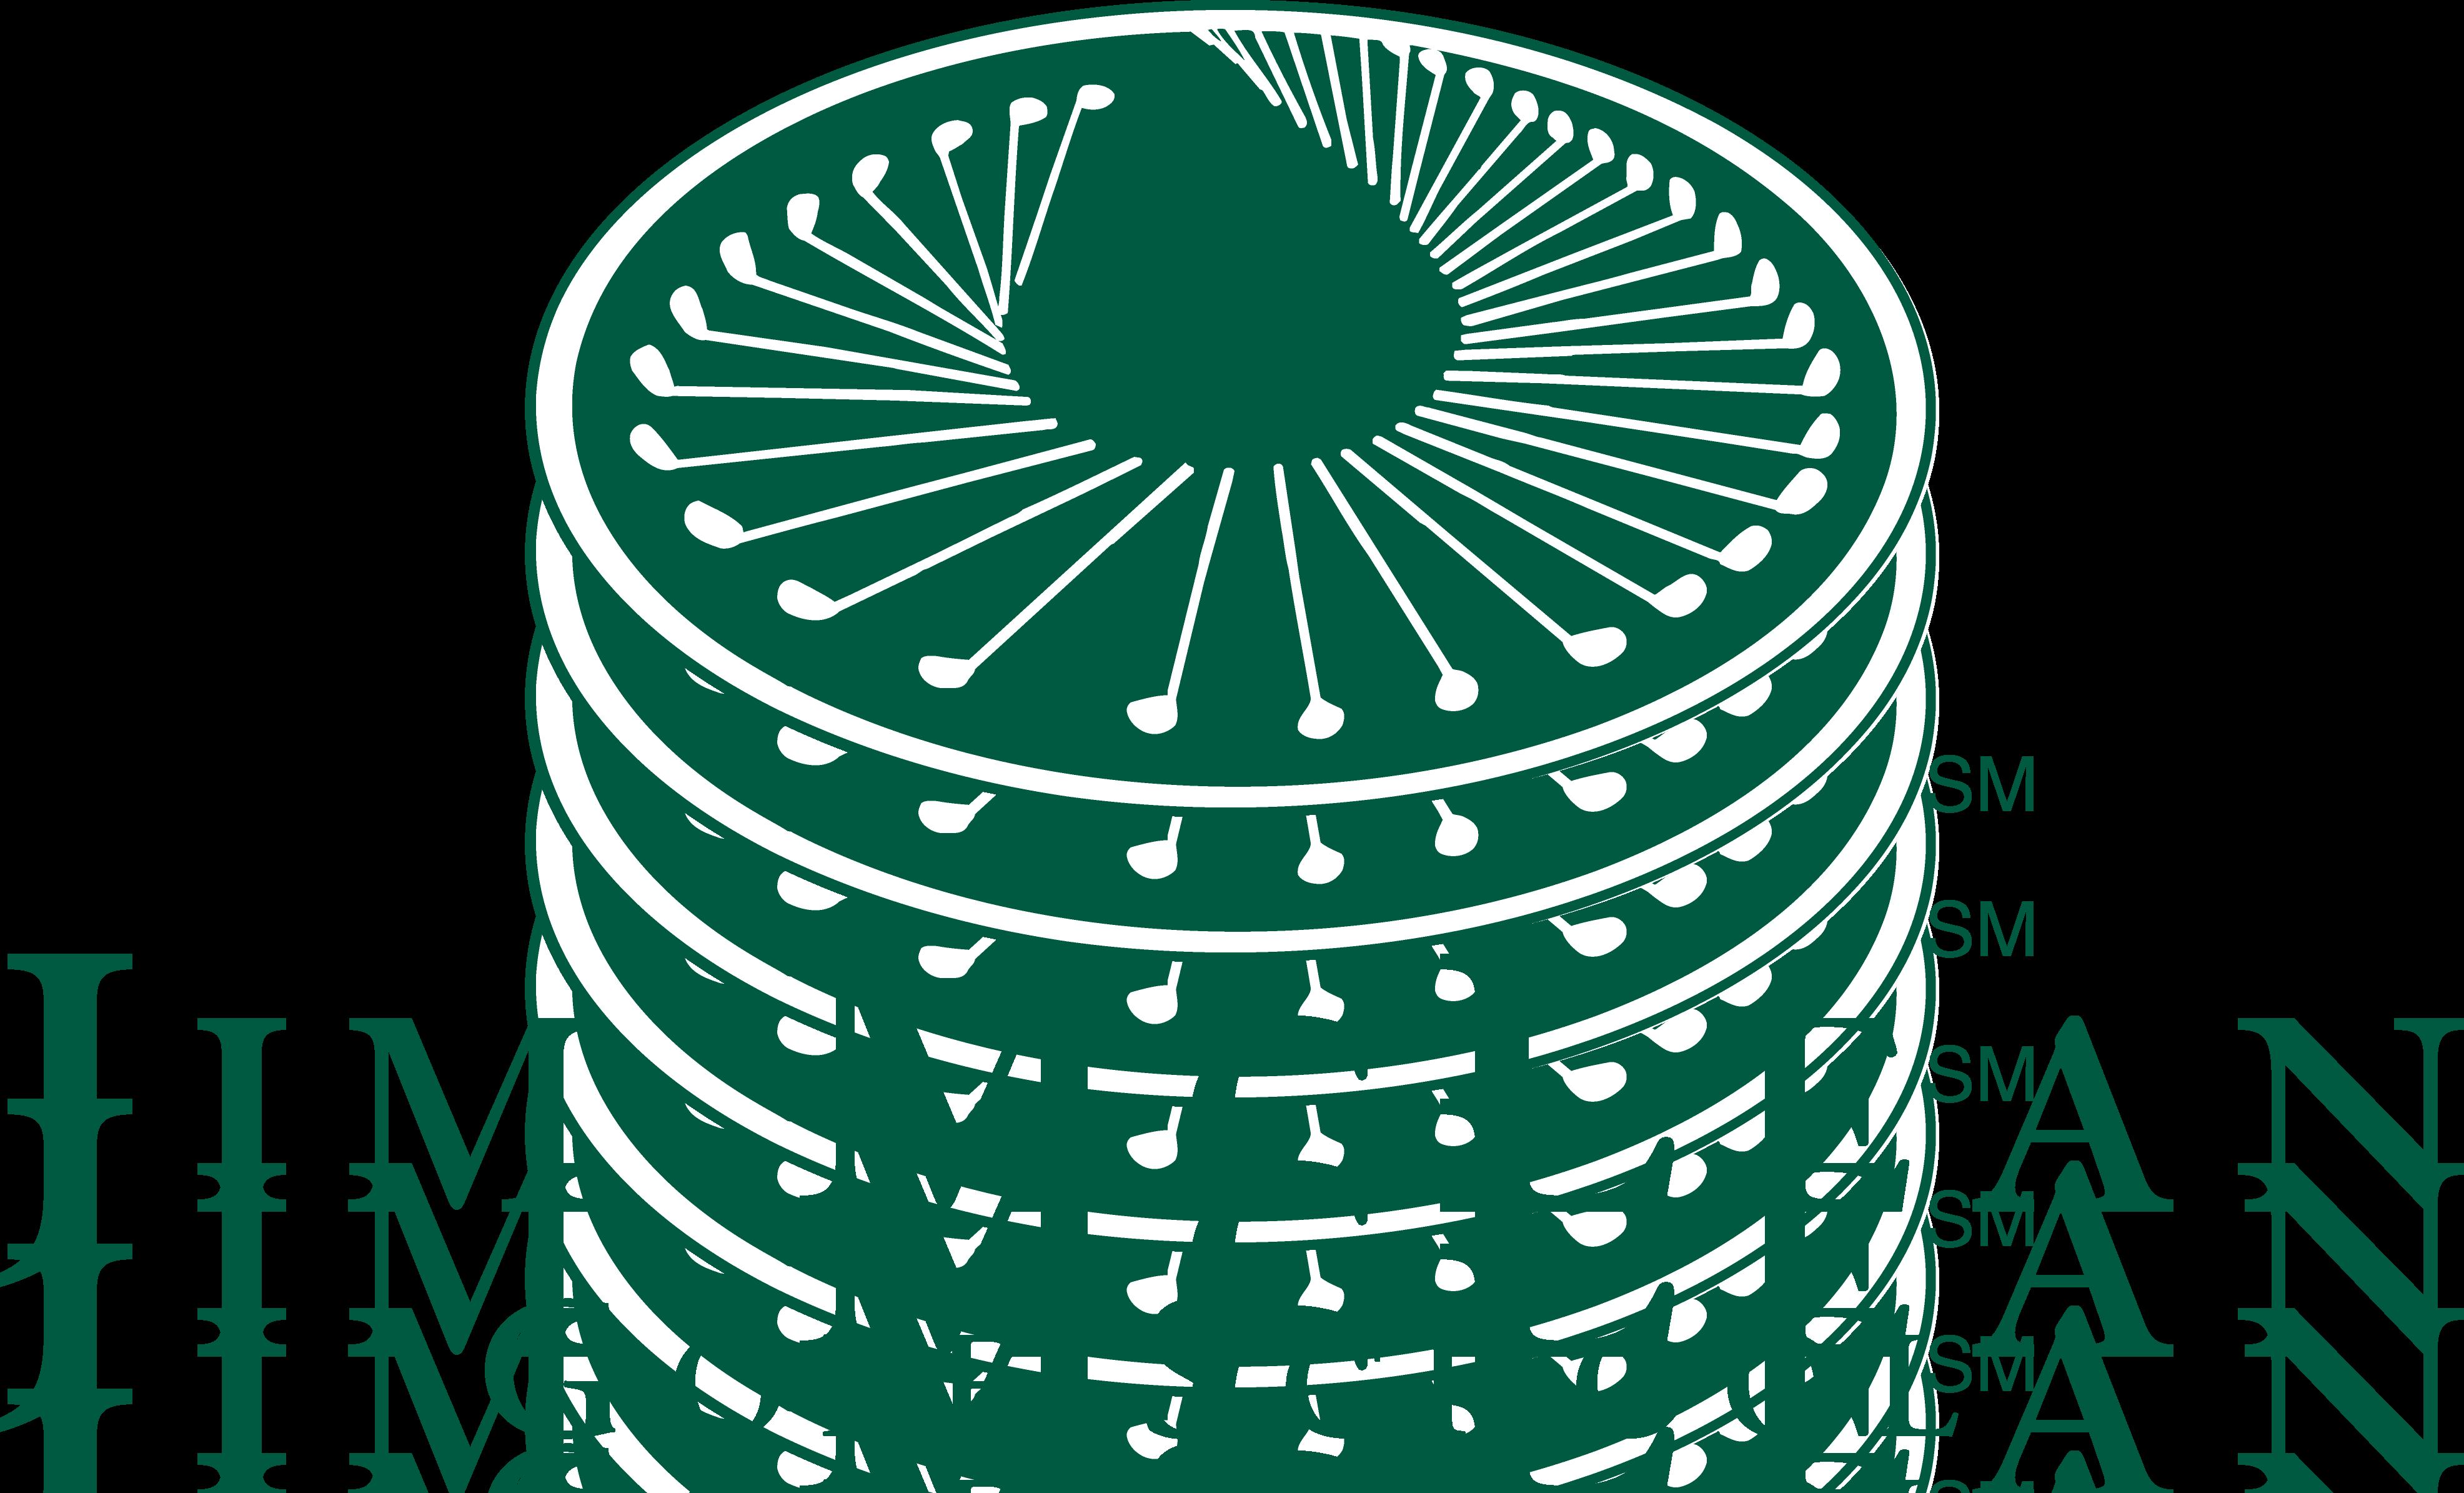 Jim McLean Golf School, a Doral Chamber of Commerce member.